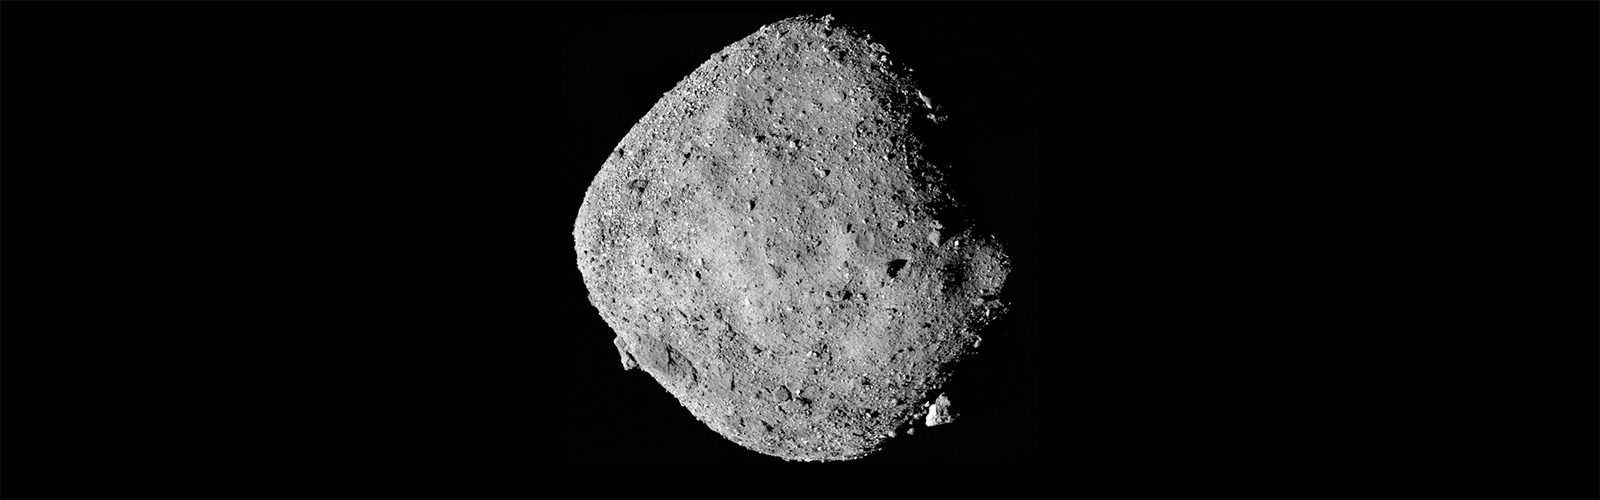 Overview | 101955 Bennu – Solar System Exploration: NASA ...